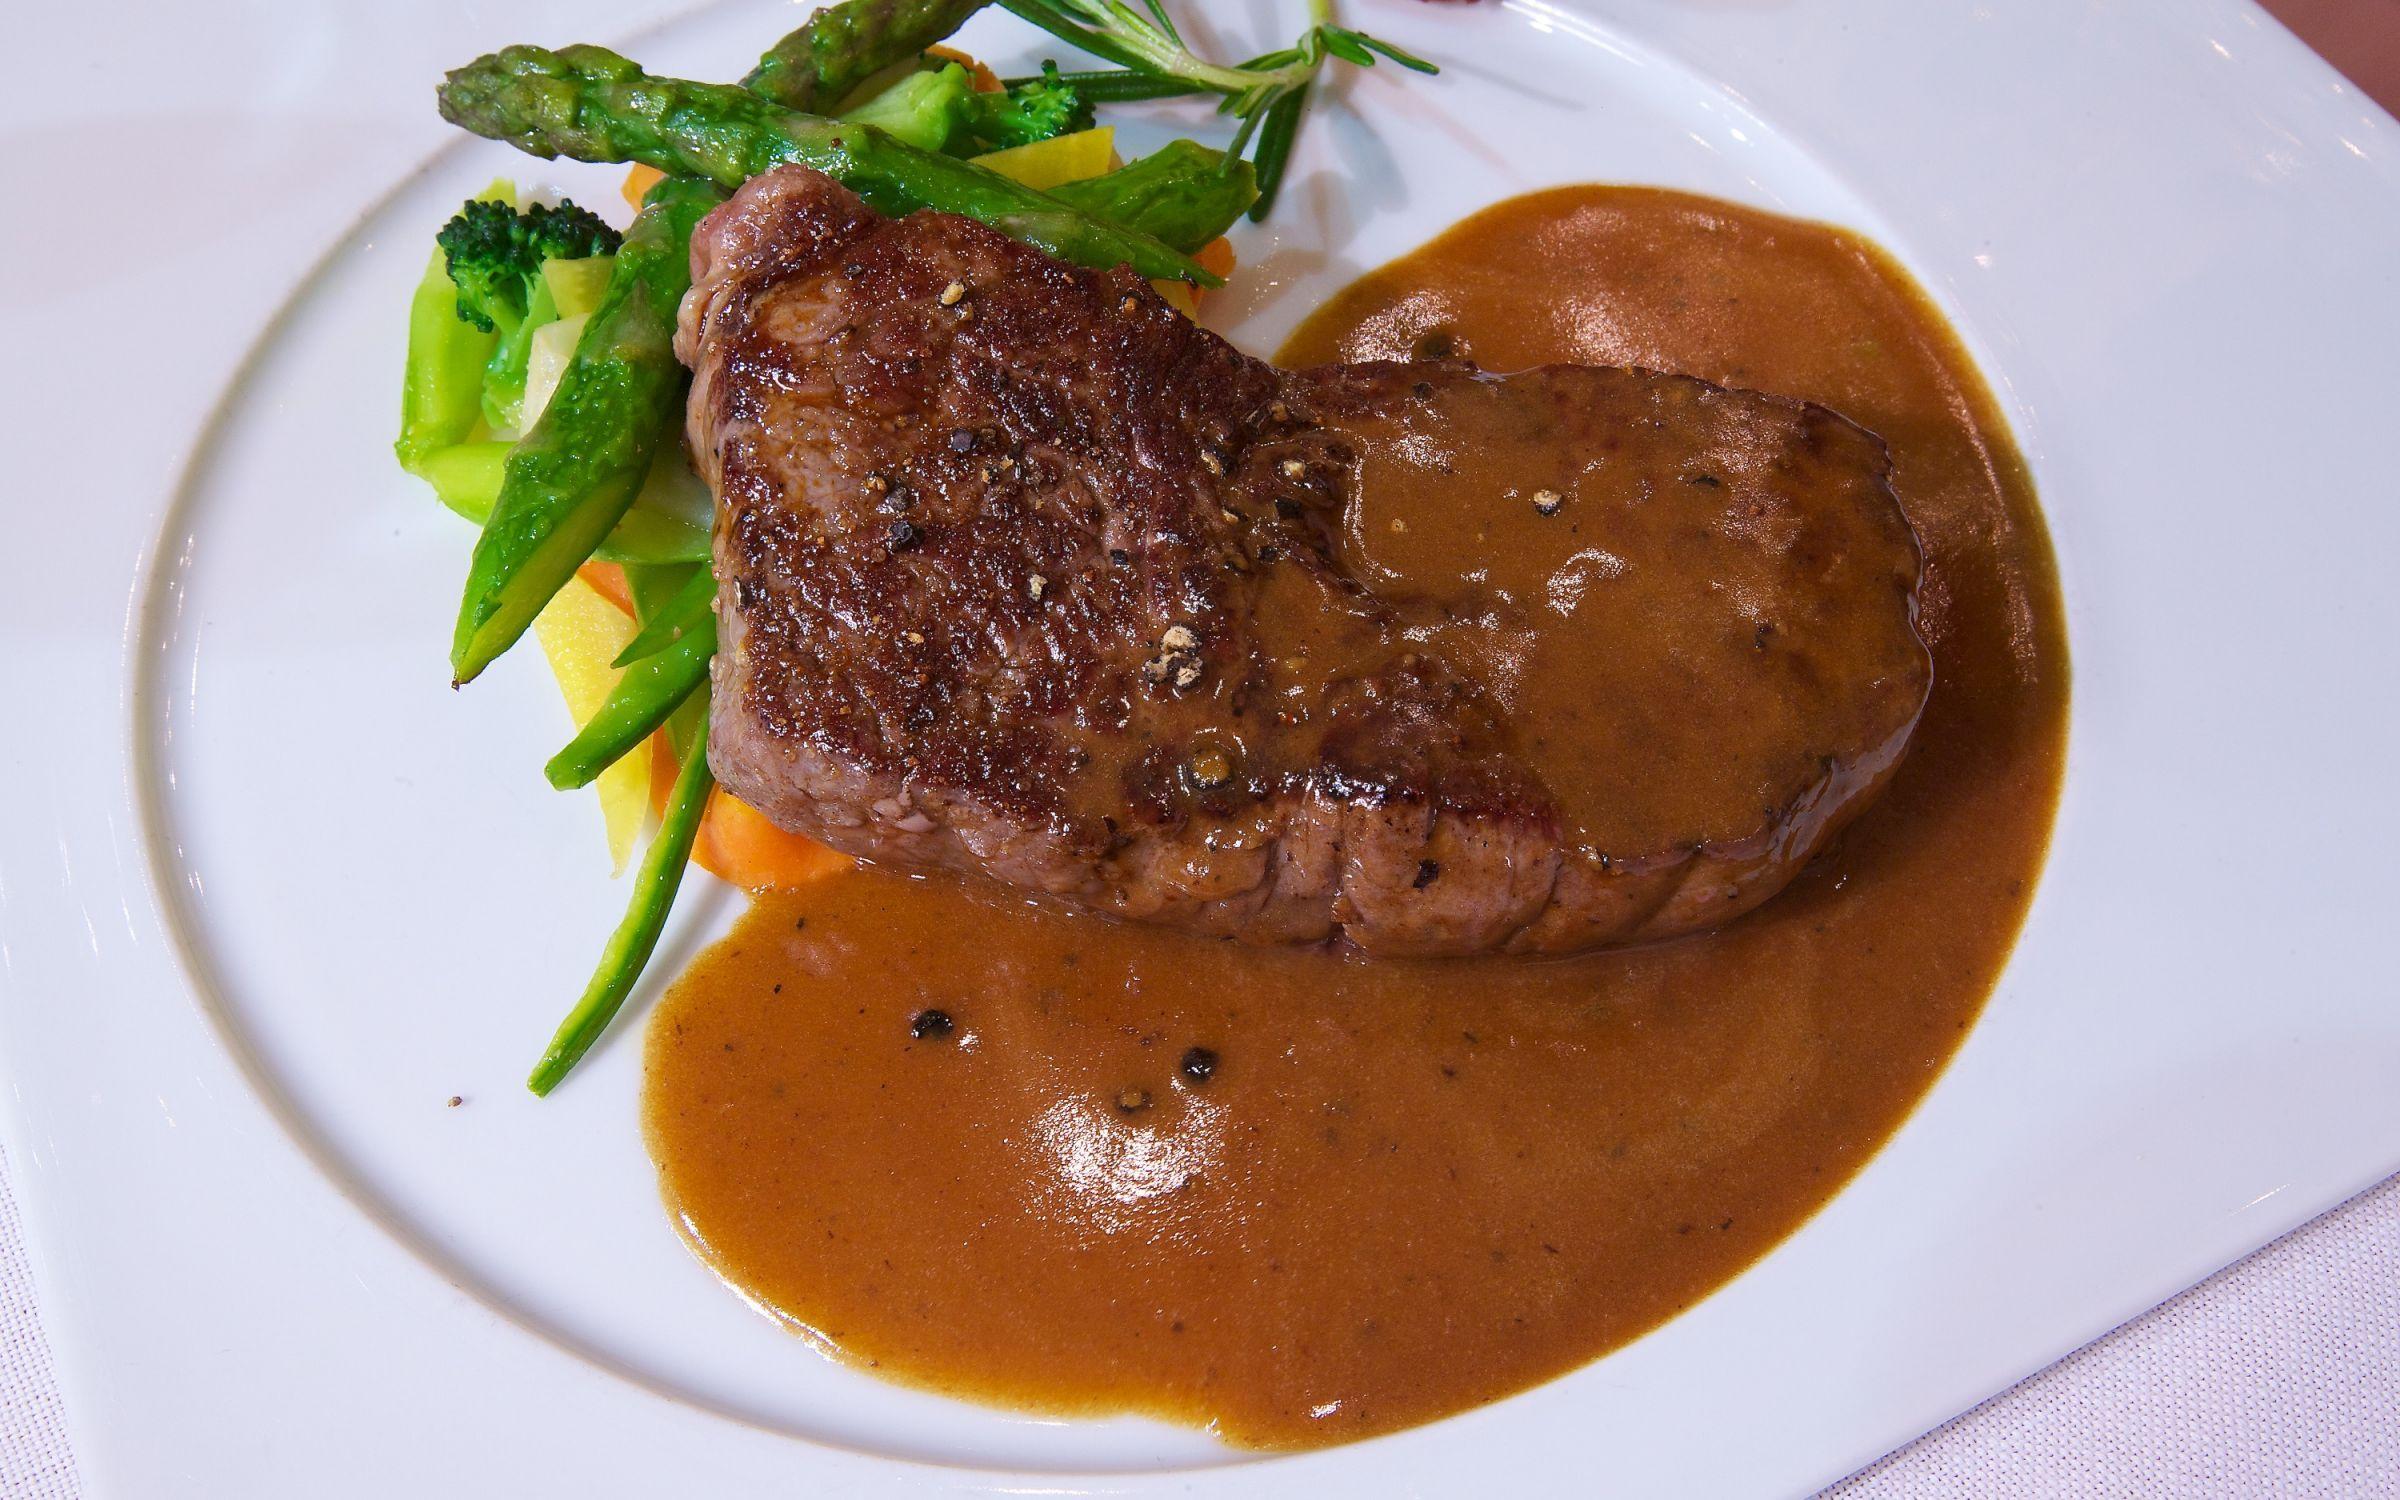 Caf beau rivage qli travel qli travel restaurants for Au beau rivage la cuisine